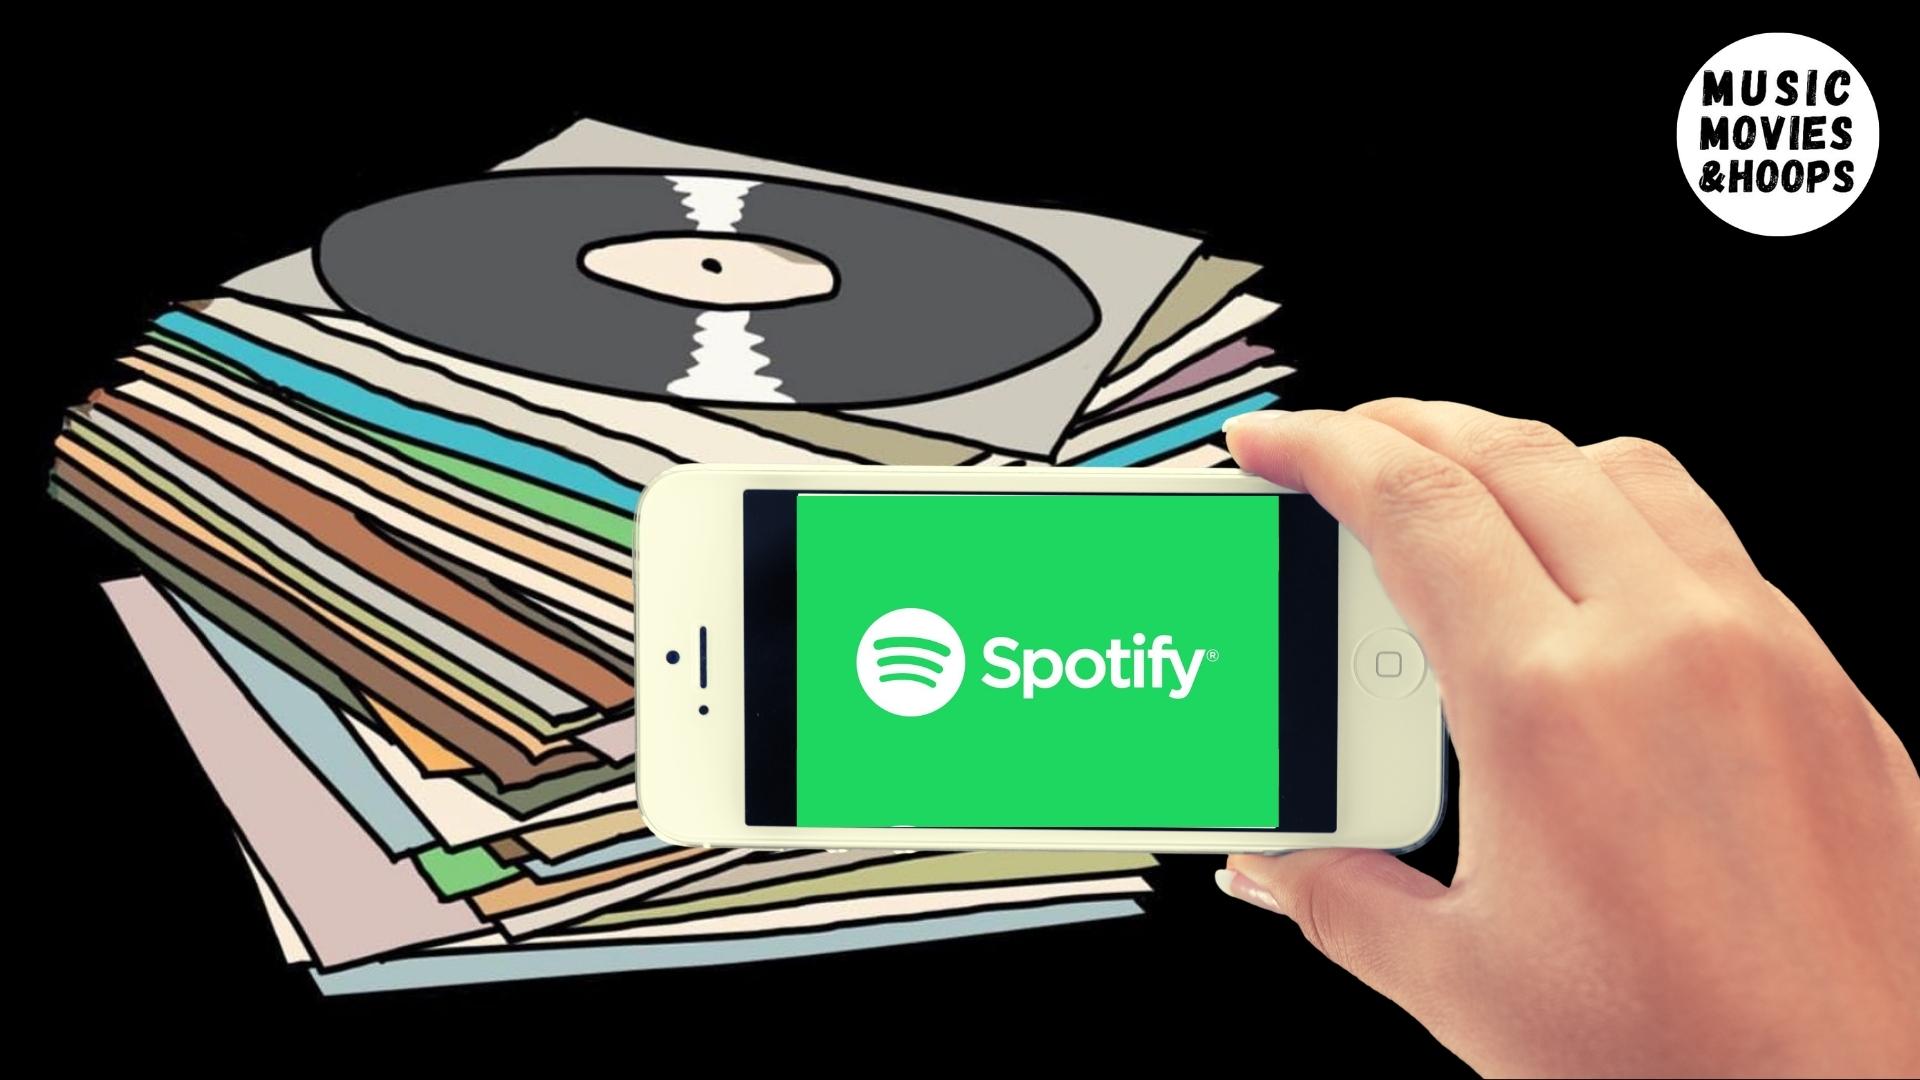 Why Do We Still Buy Records?